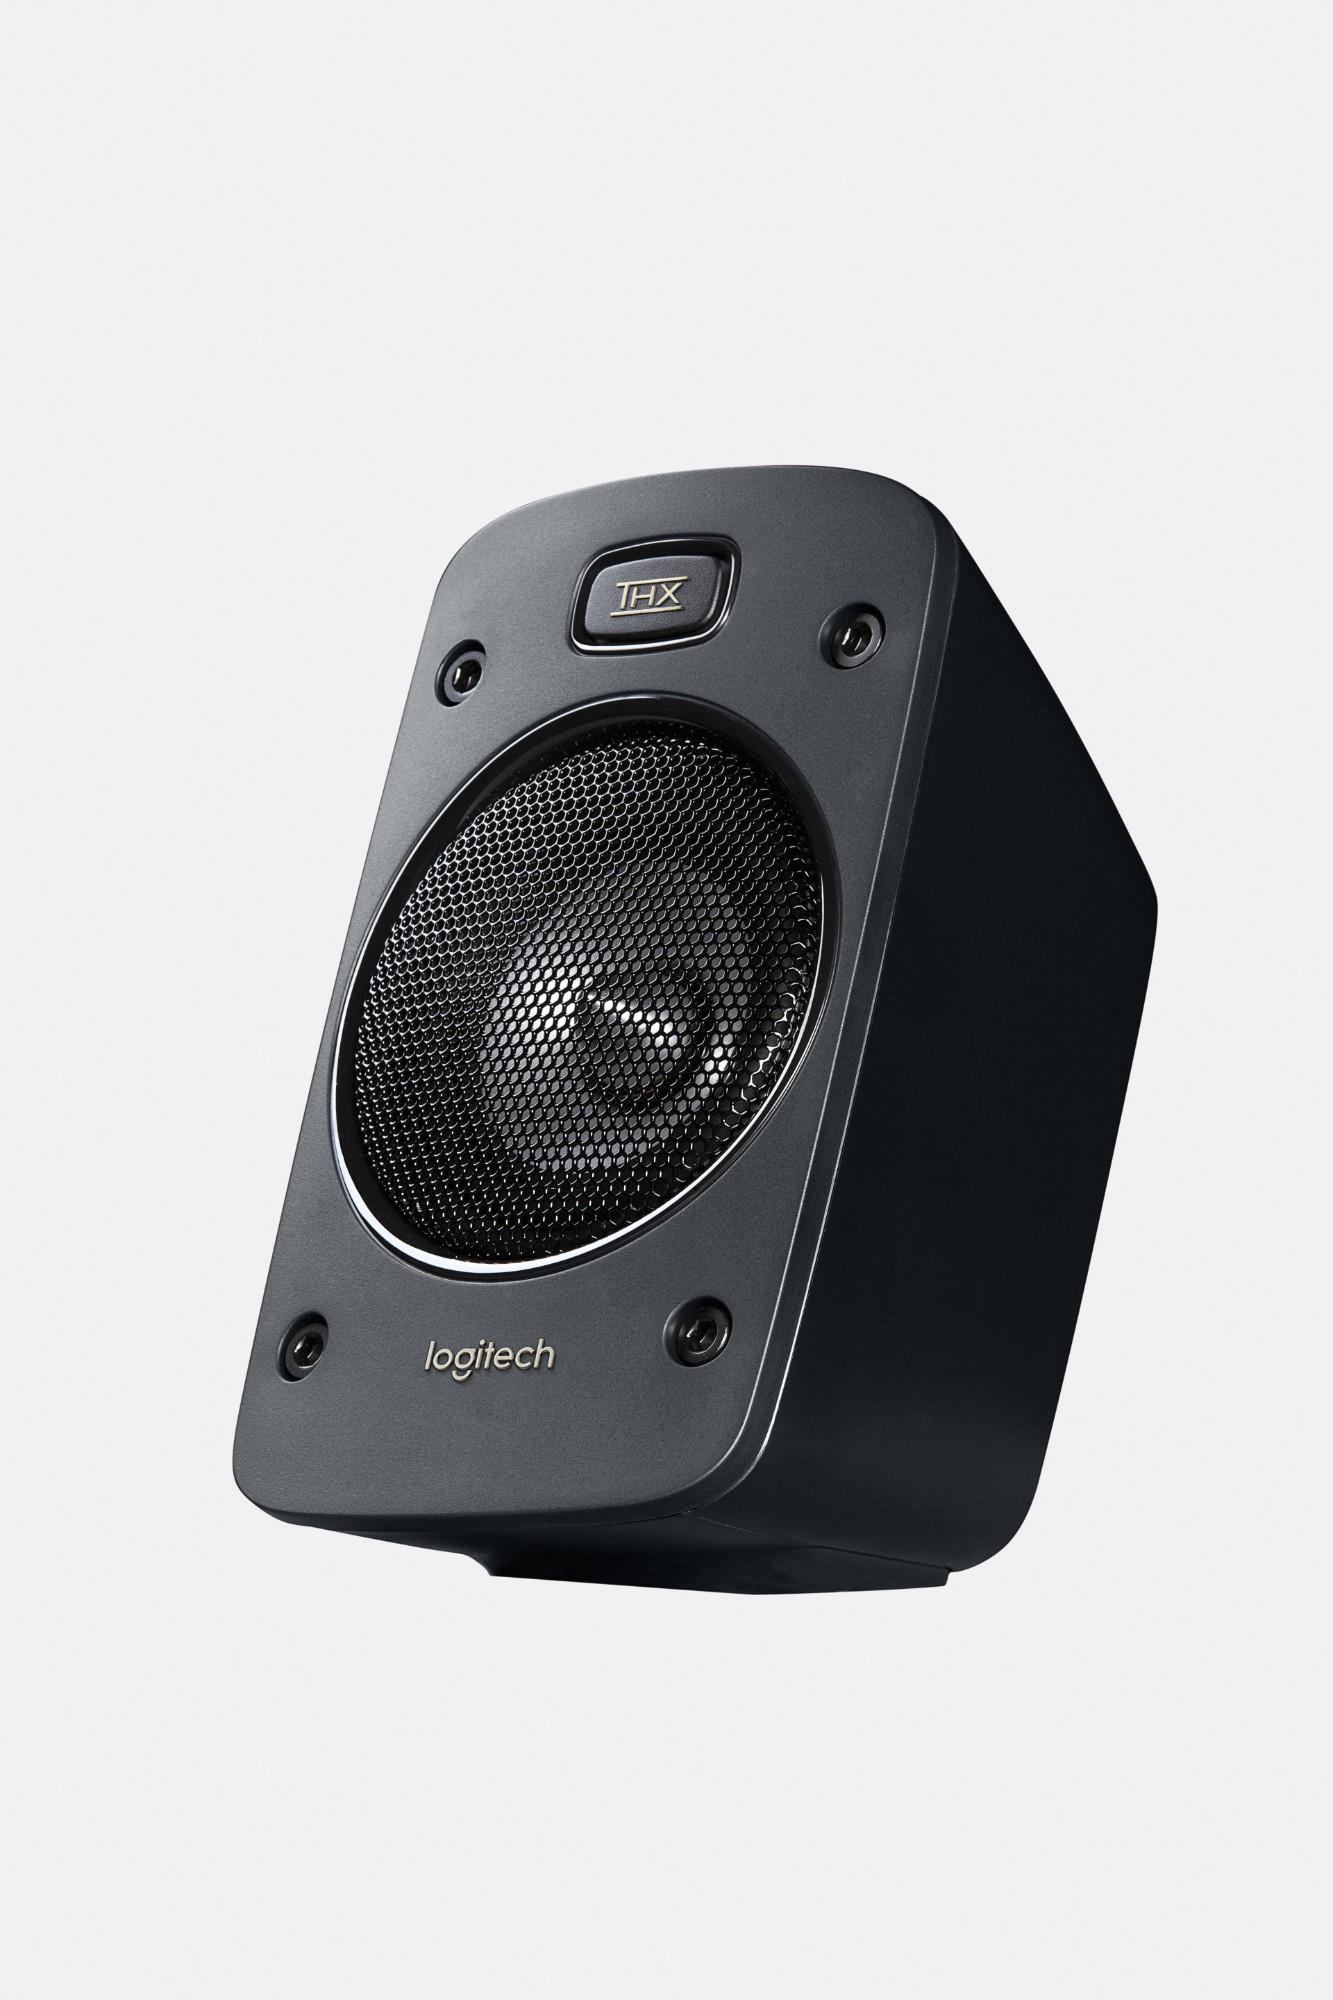 Logitech Speaker System Z in addition  also Iopanel likewise Maxresdefault in addition Wprvevi Kektzrc Widkw R. on logitech surround sound speaker system